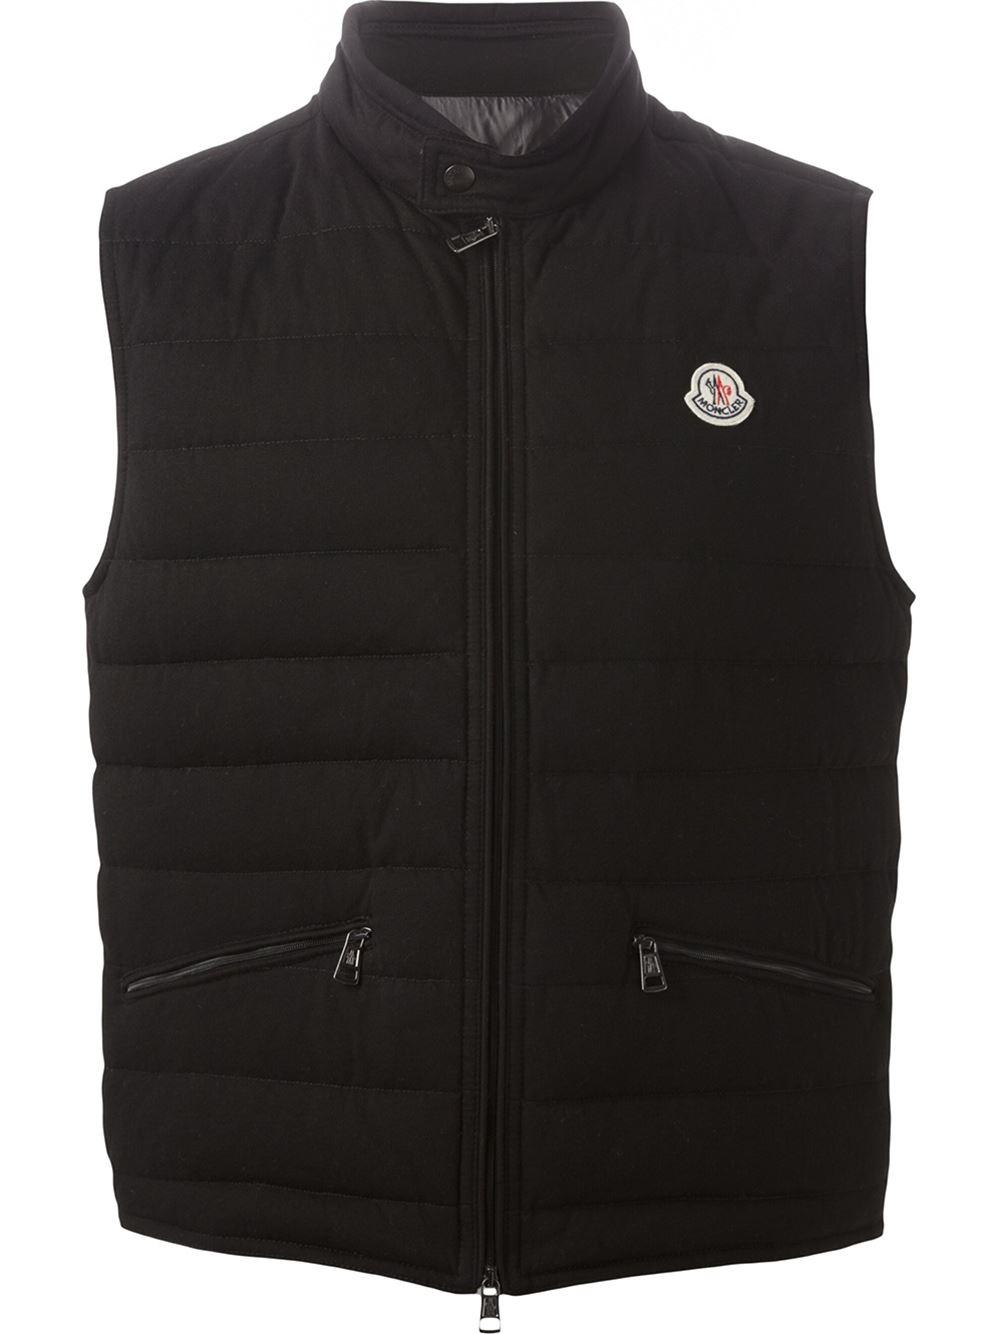 Mackage Jackets